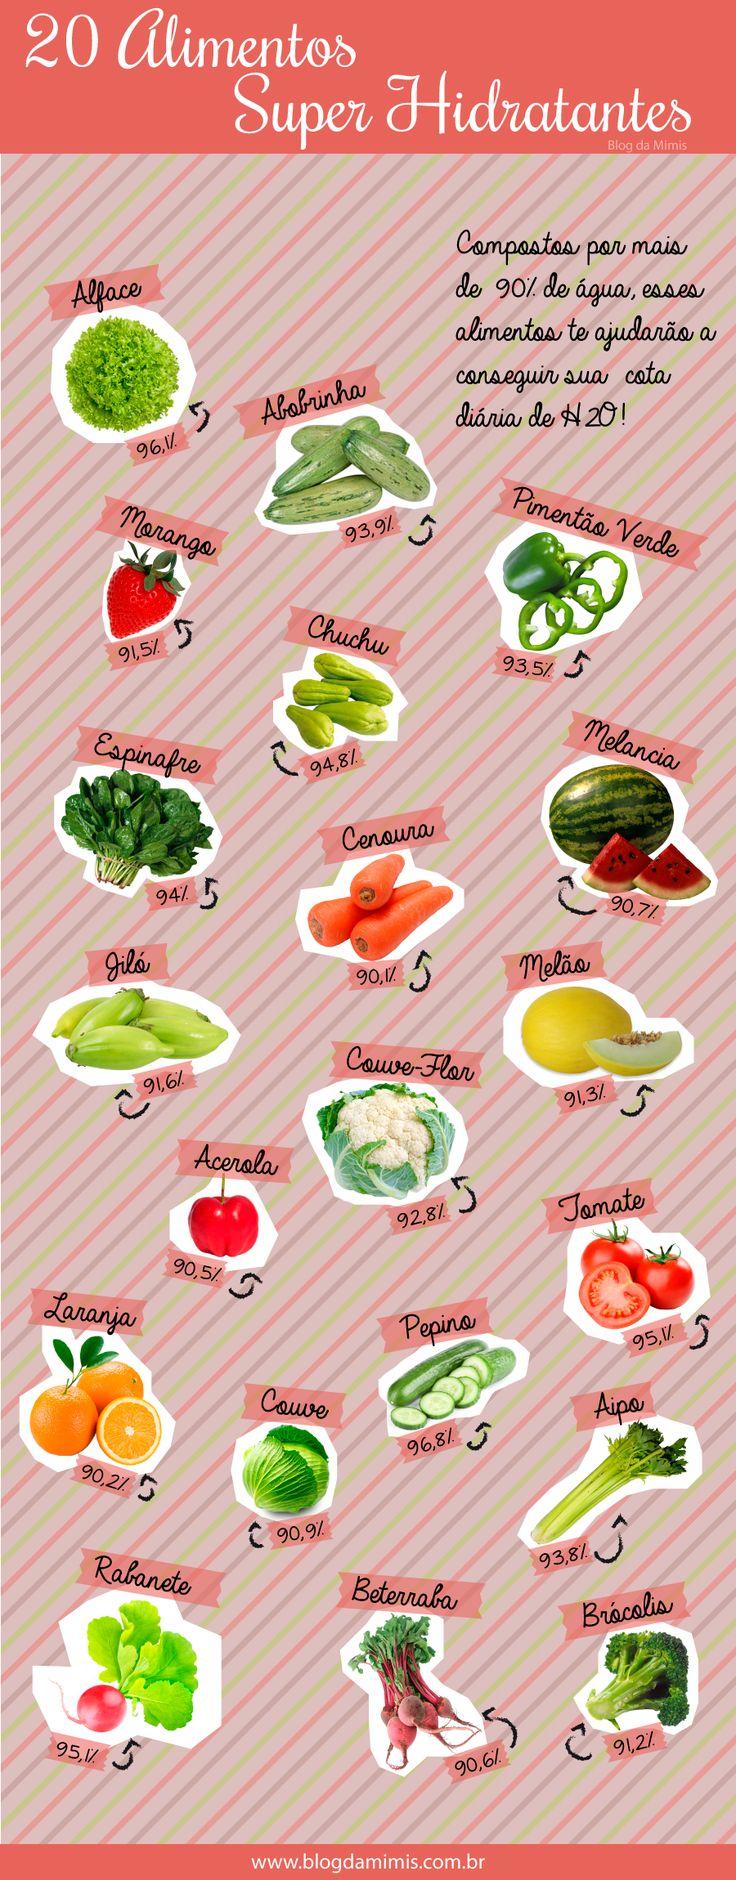 20 alimentos super hidratantes 4